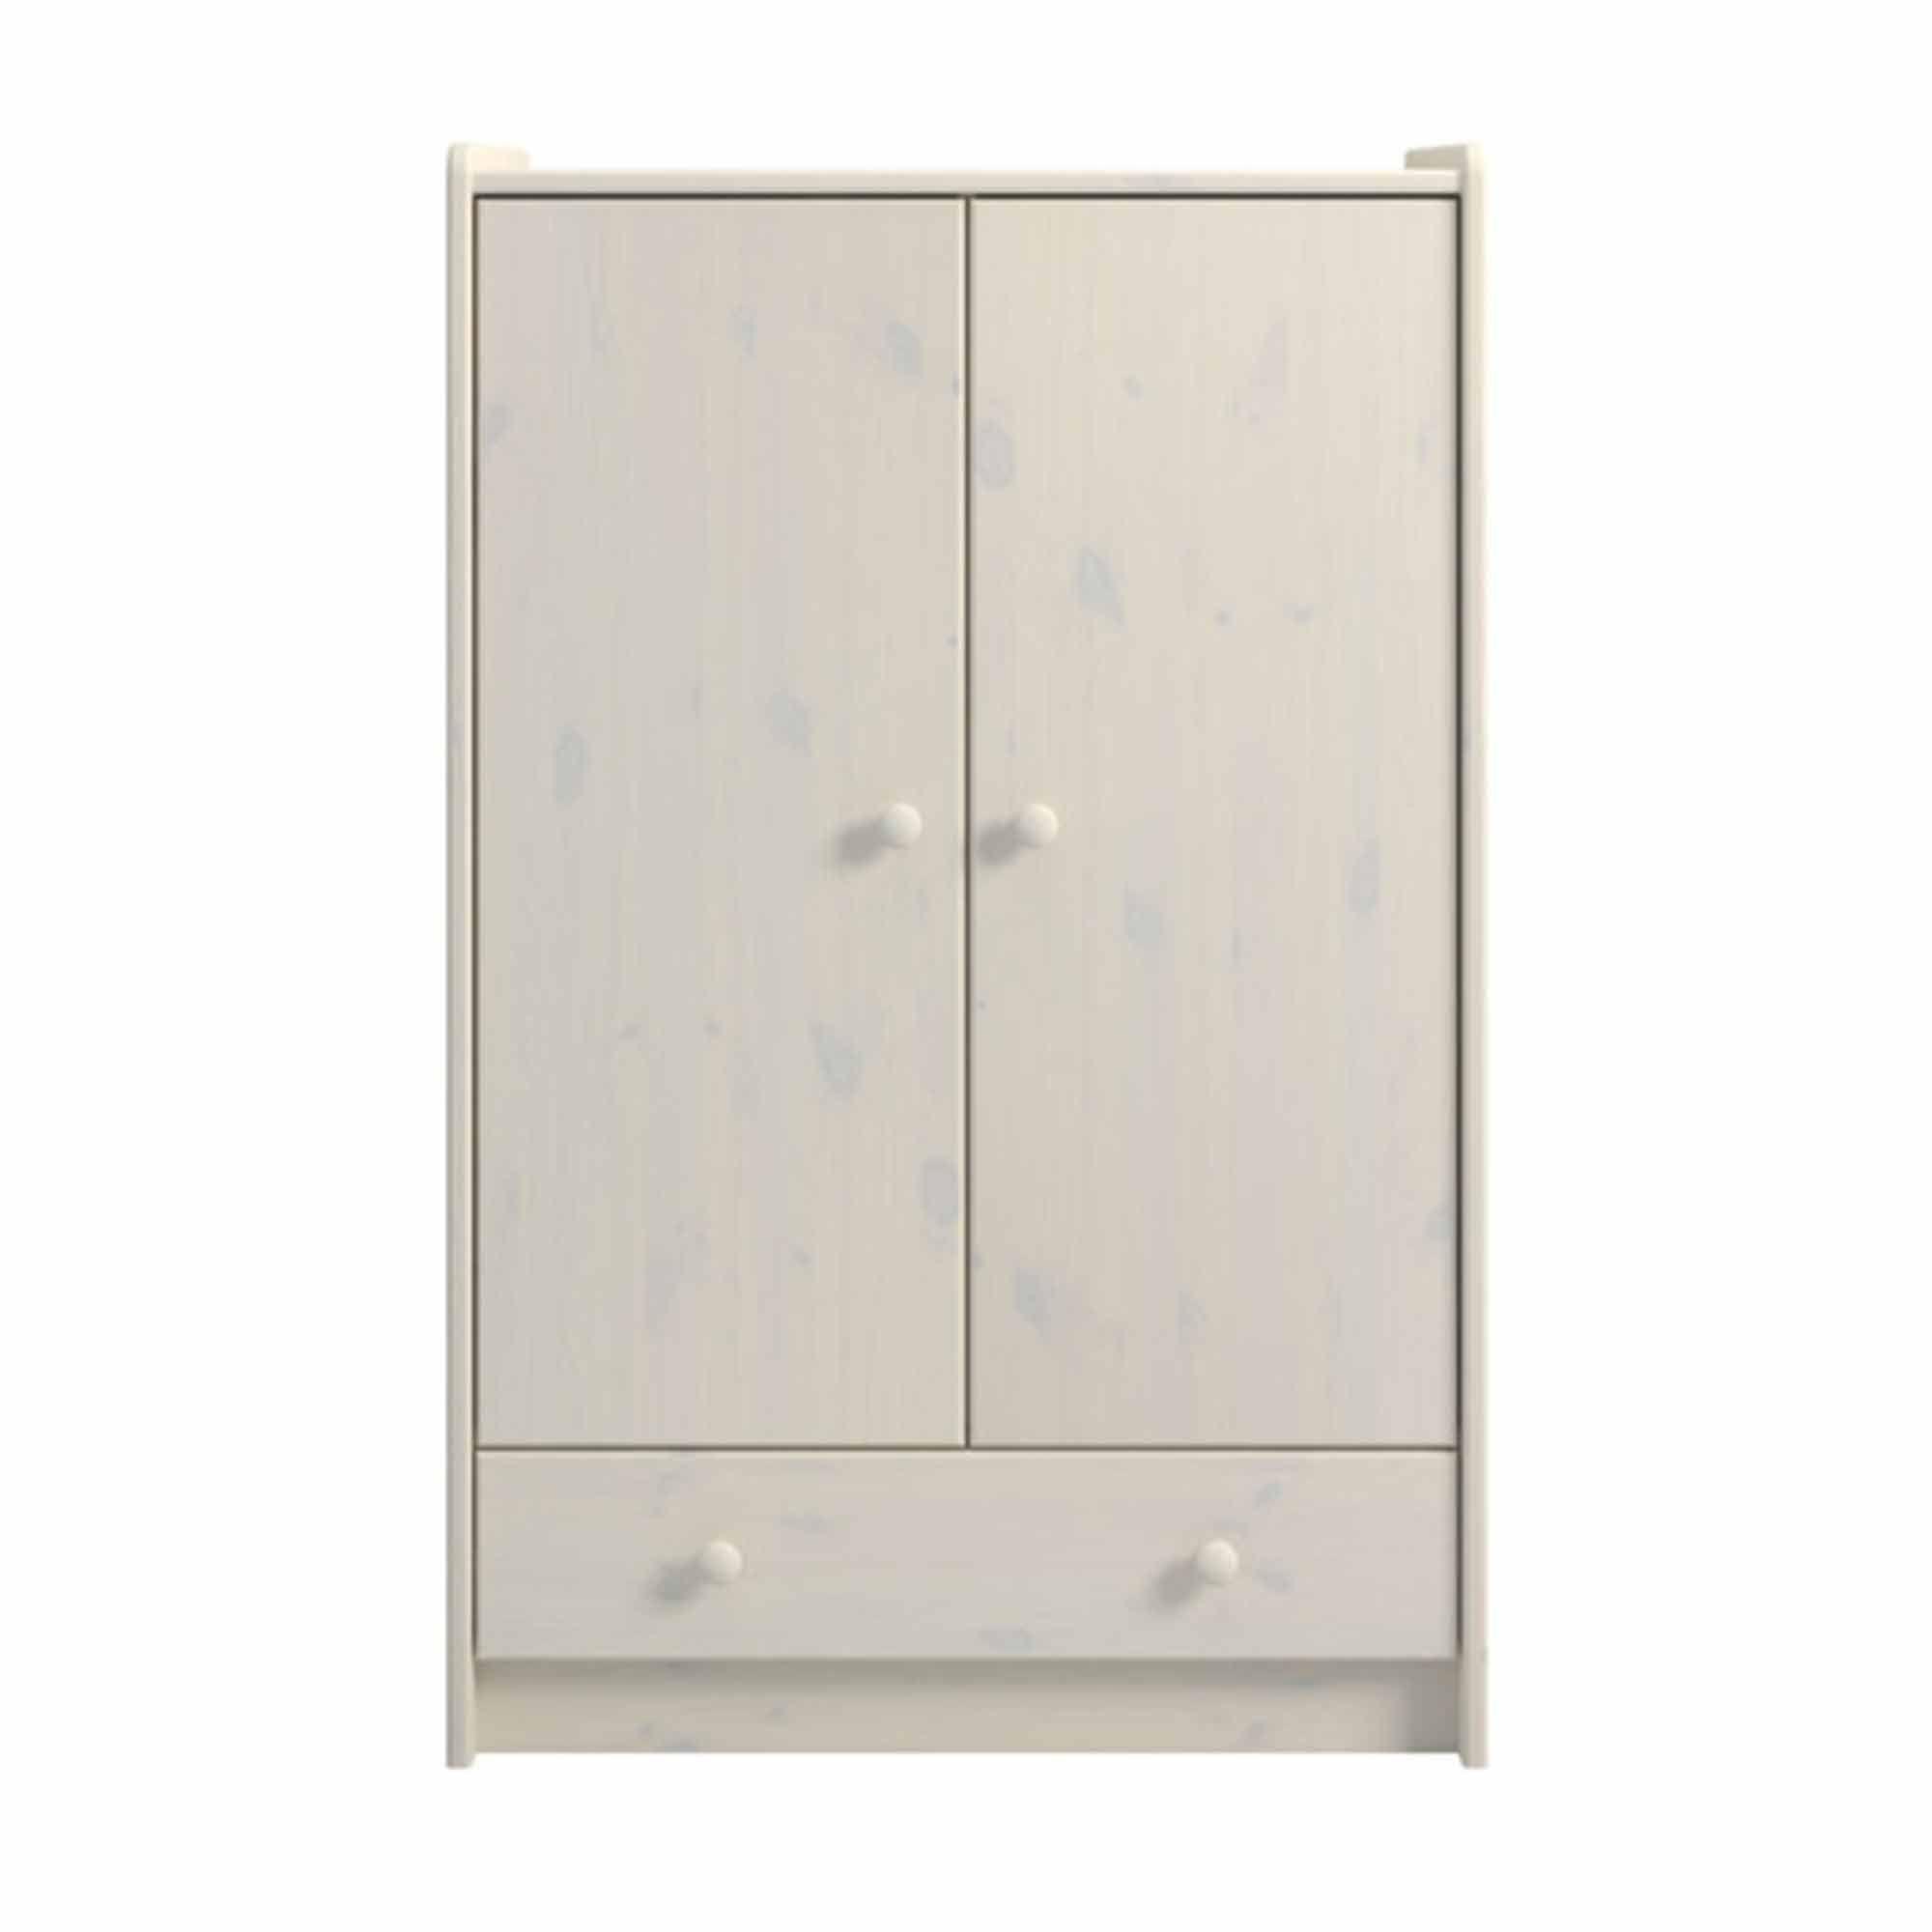 Steens Kids 2 Doors 1-Drawer Wardrobe Whitewash Finish